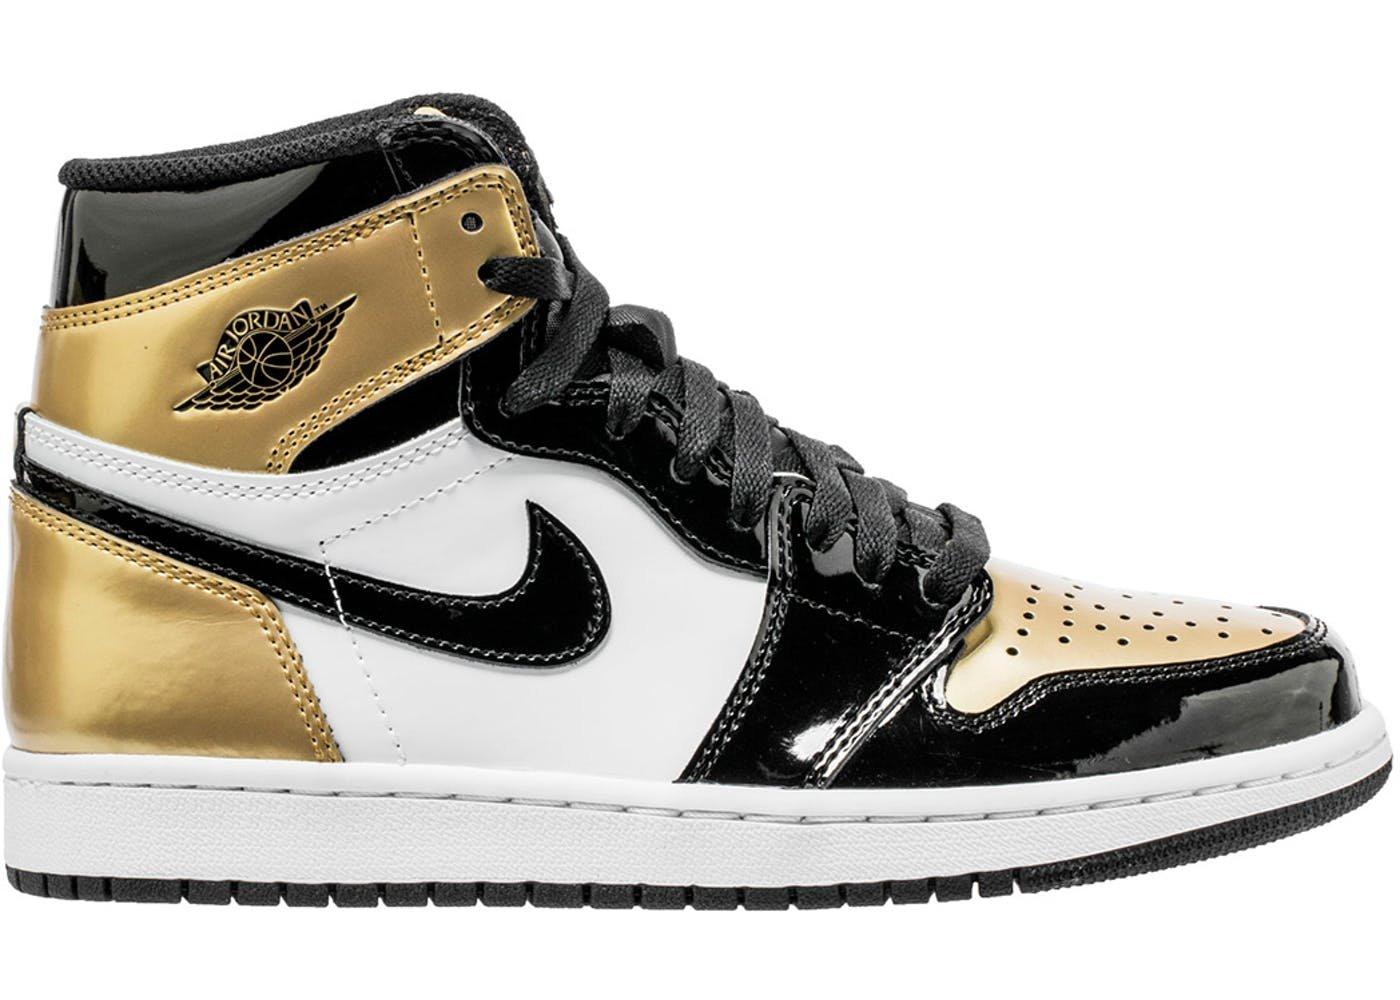 NIKE Air Jordan 1 Retro High OG NRG 861428 007'' Gold Toe (9)